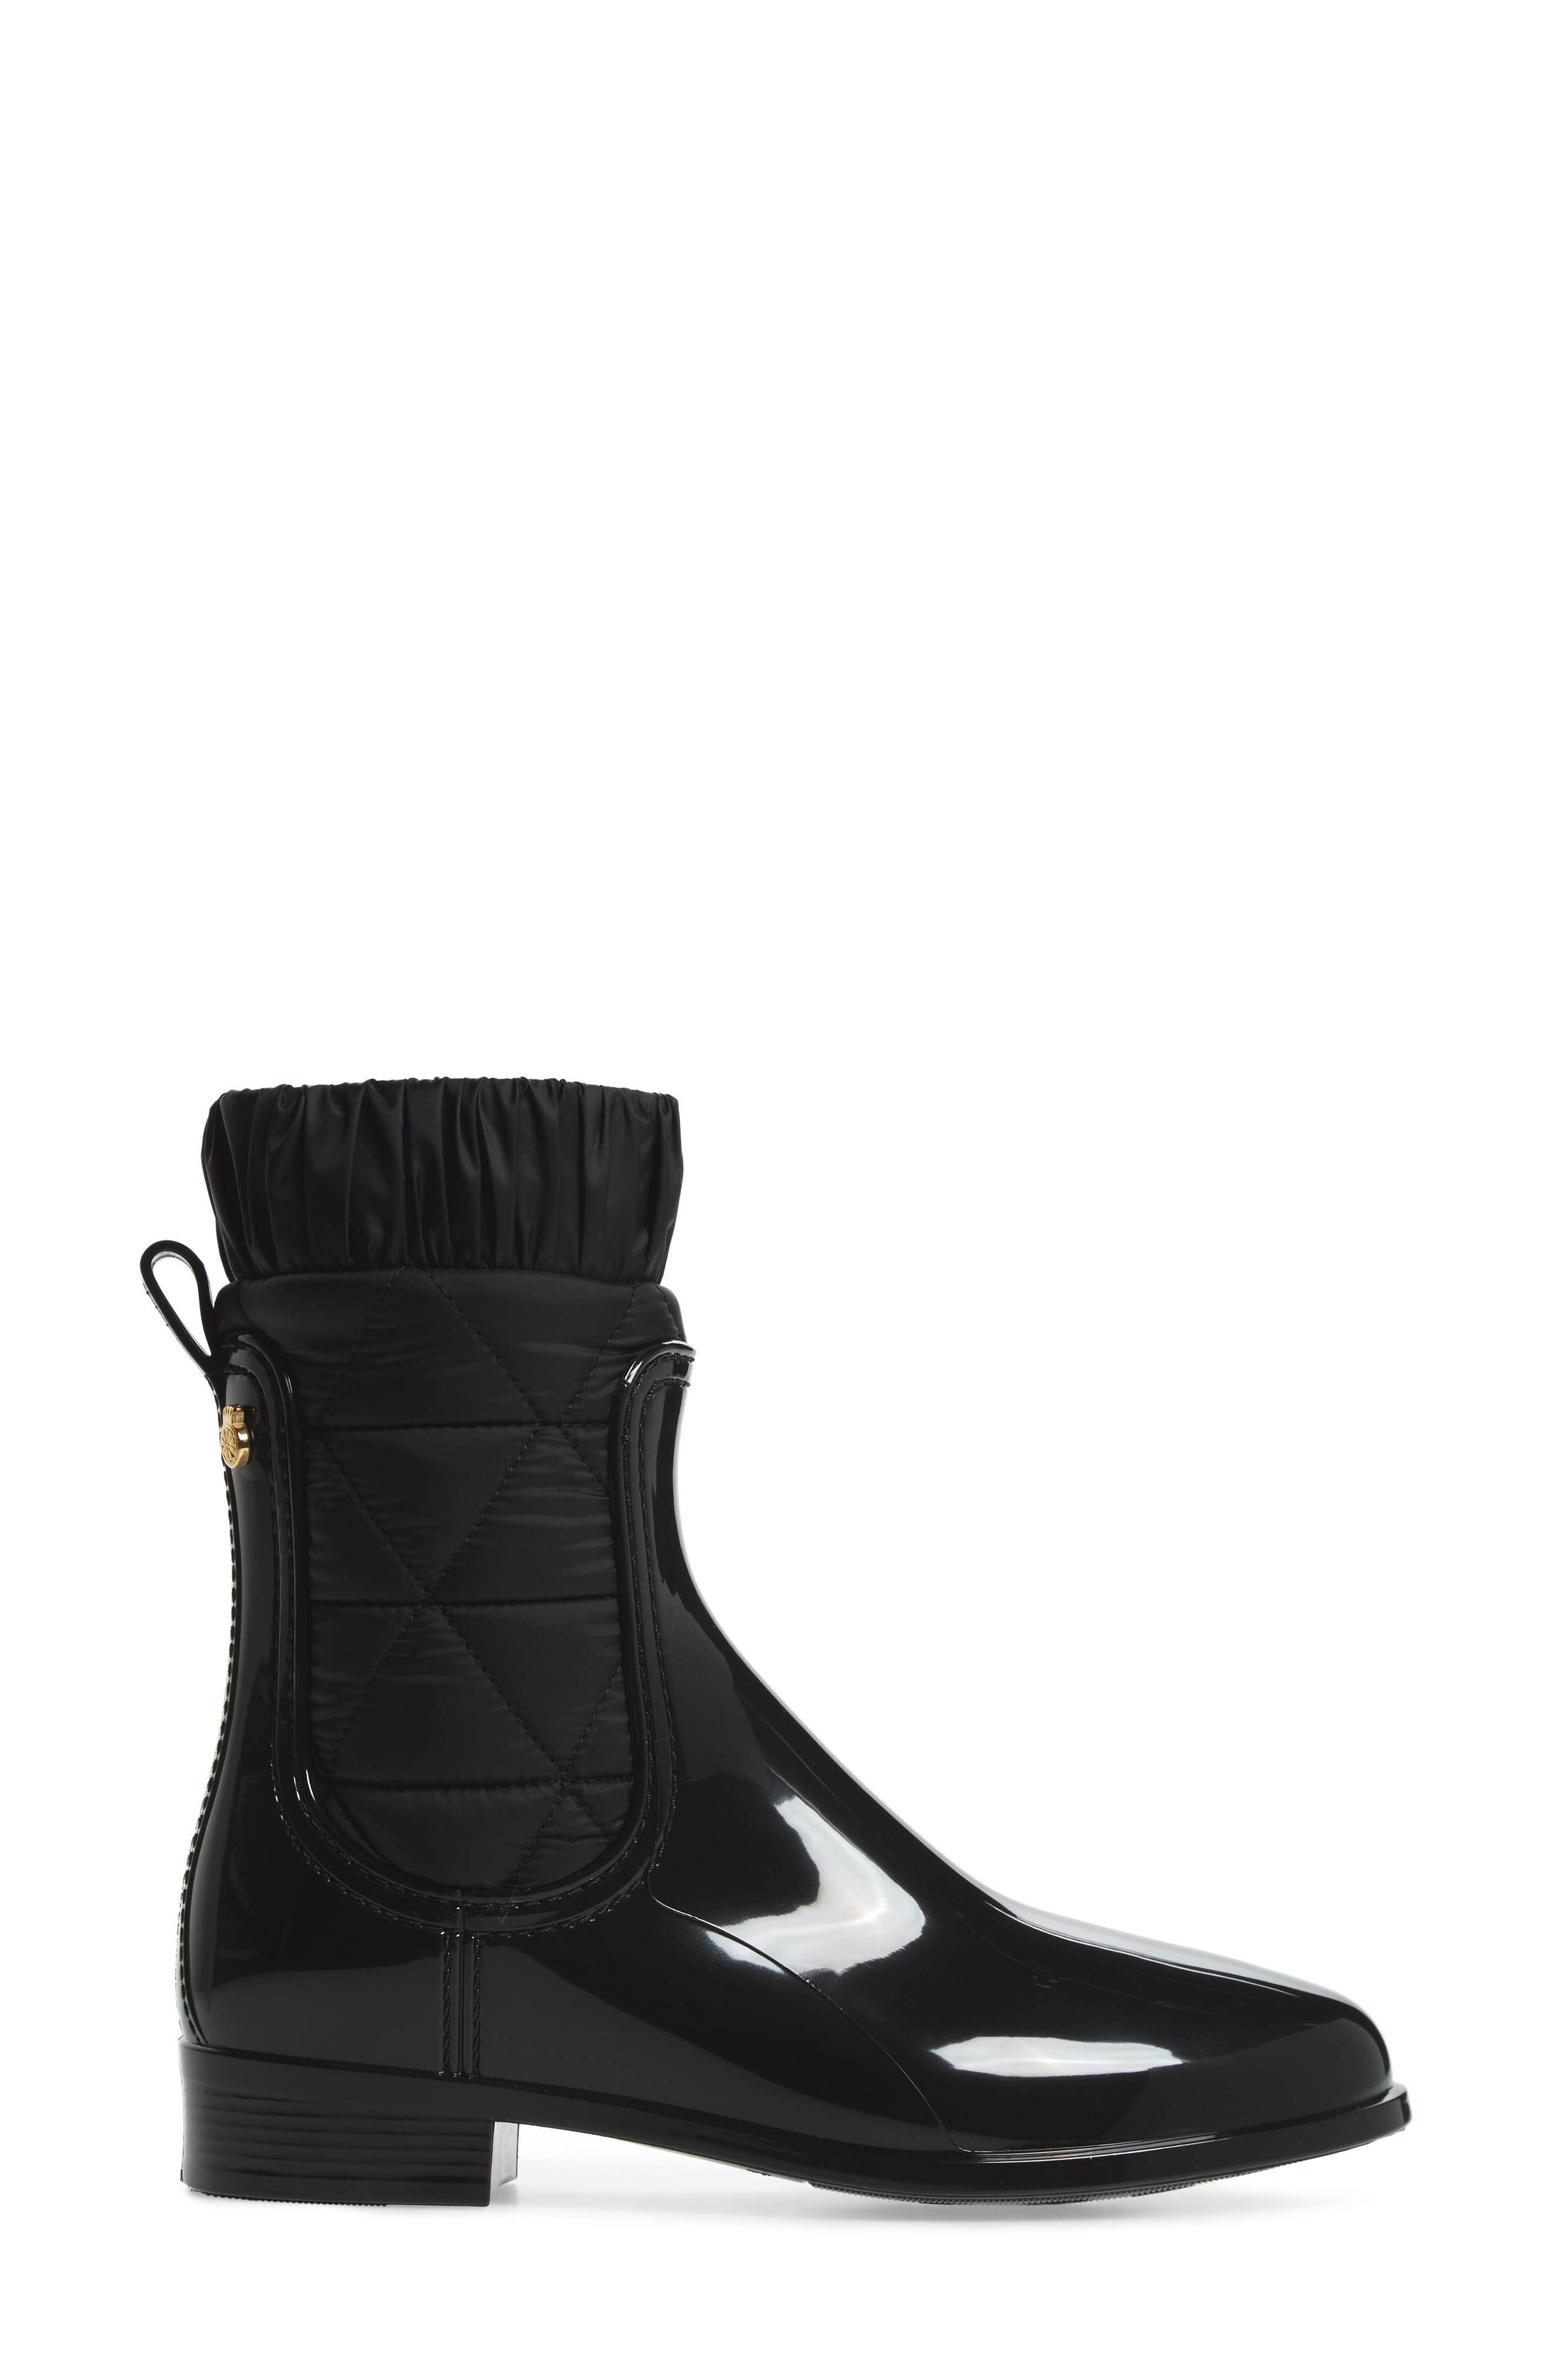 Adele Waterproof Boot,                             Alternate thumbnail 3, color,                             BLACK GLOSS